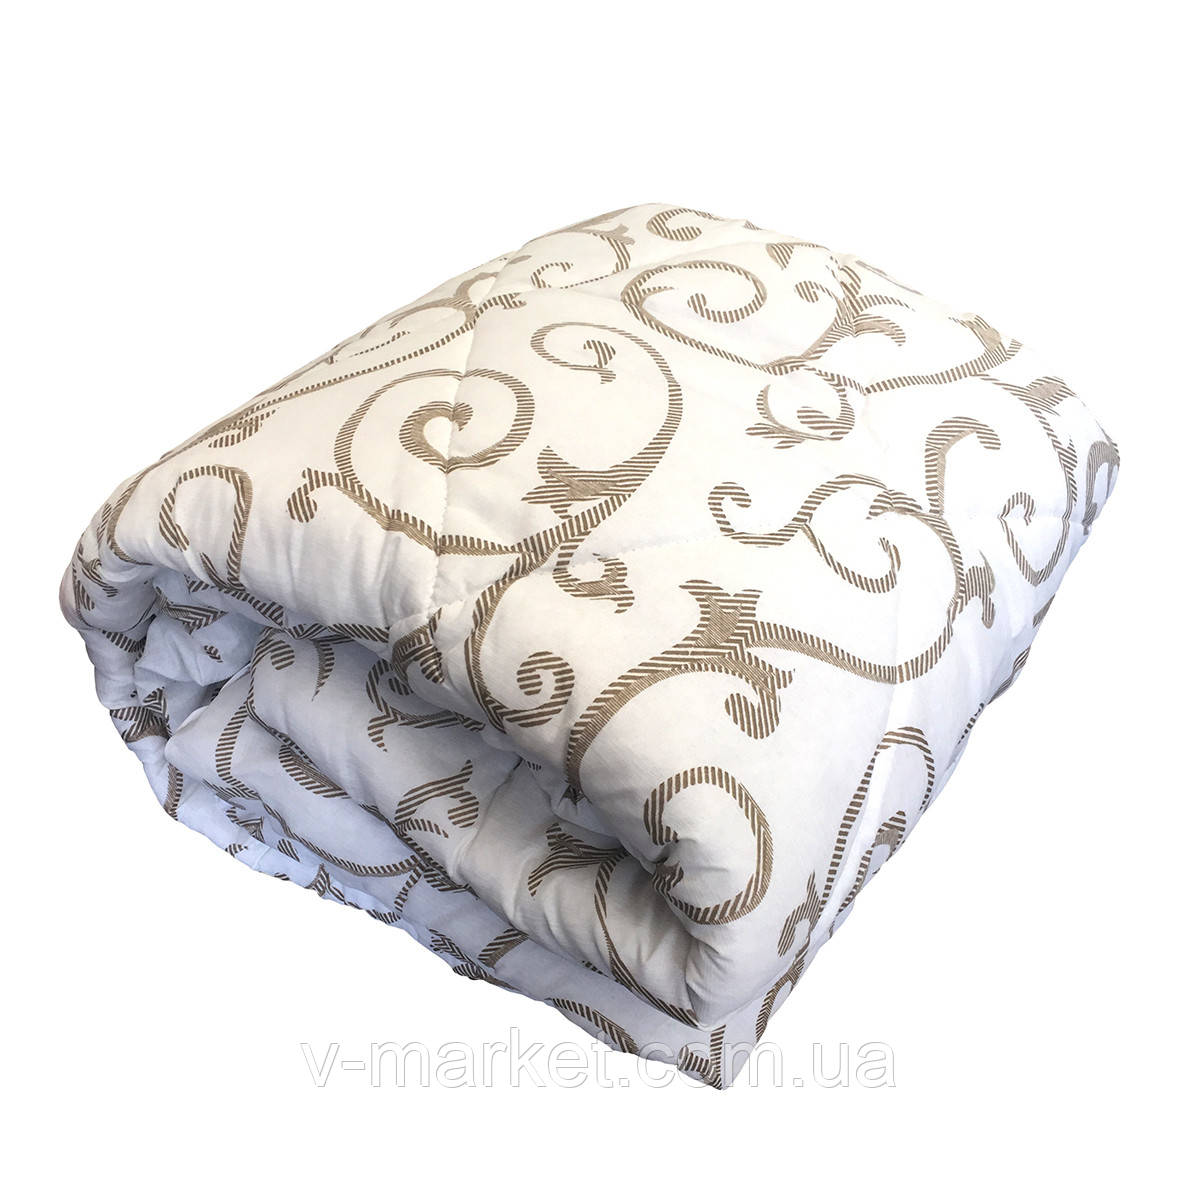 Ковдра полуторна холлофайбер СТАНДАРТ, тканина бязь (полікотон)